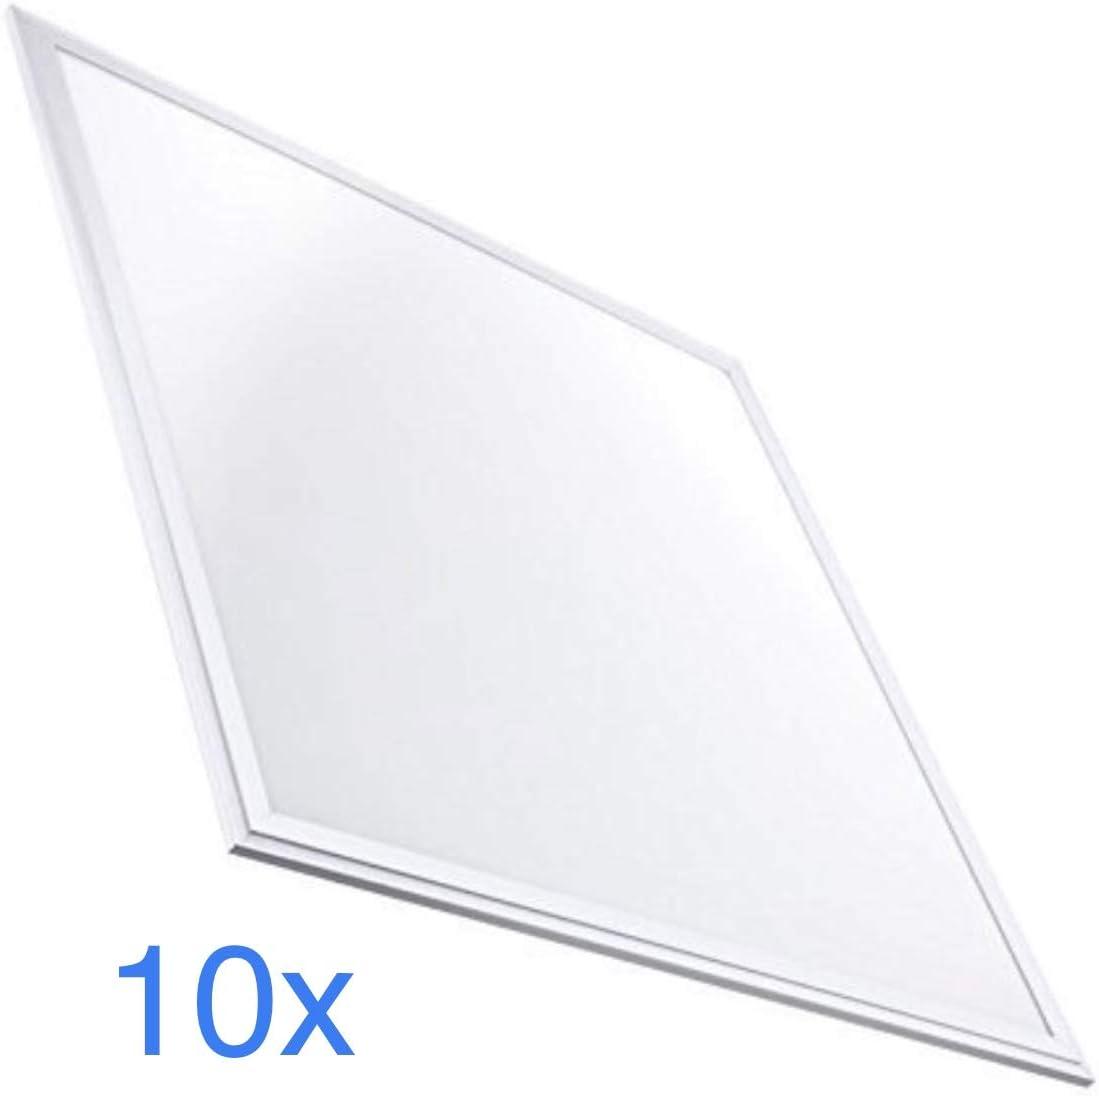 Pack 10x Panel LED Slim 60x60 cm, 40w, Color Blanco Frío (6500K). 3200 Lumenes. Driver incluido. A++